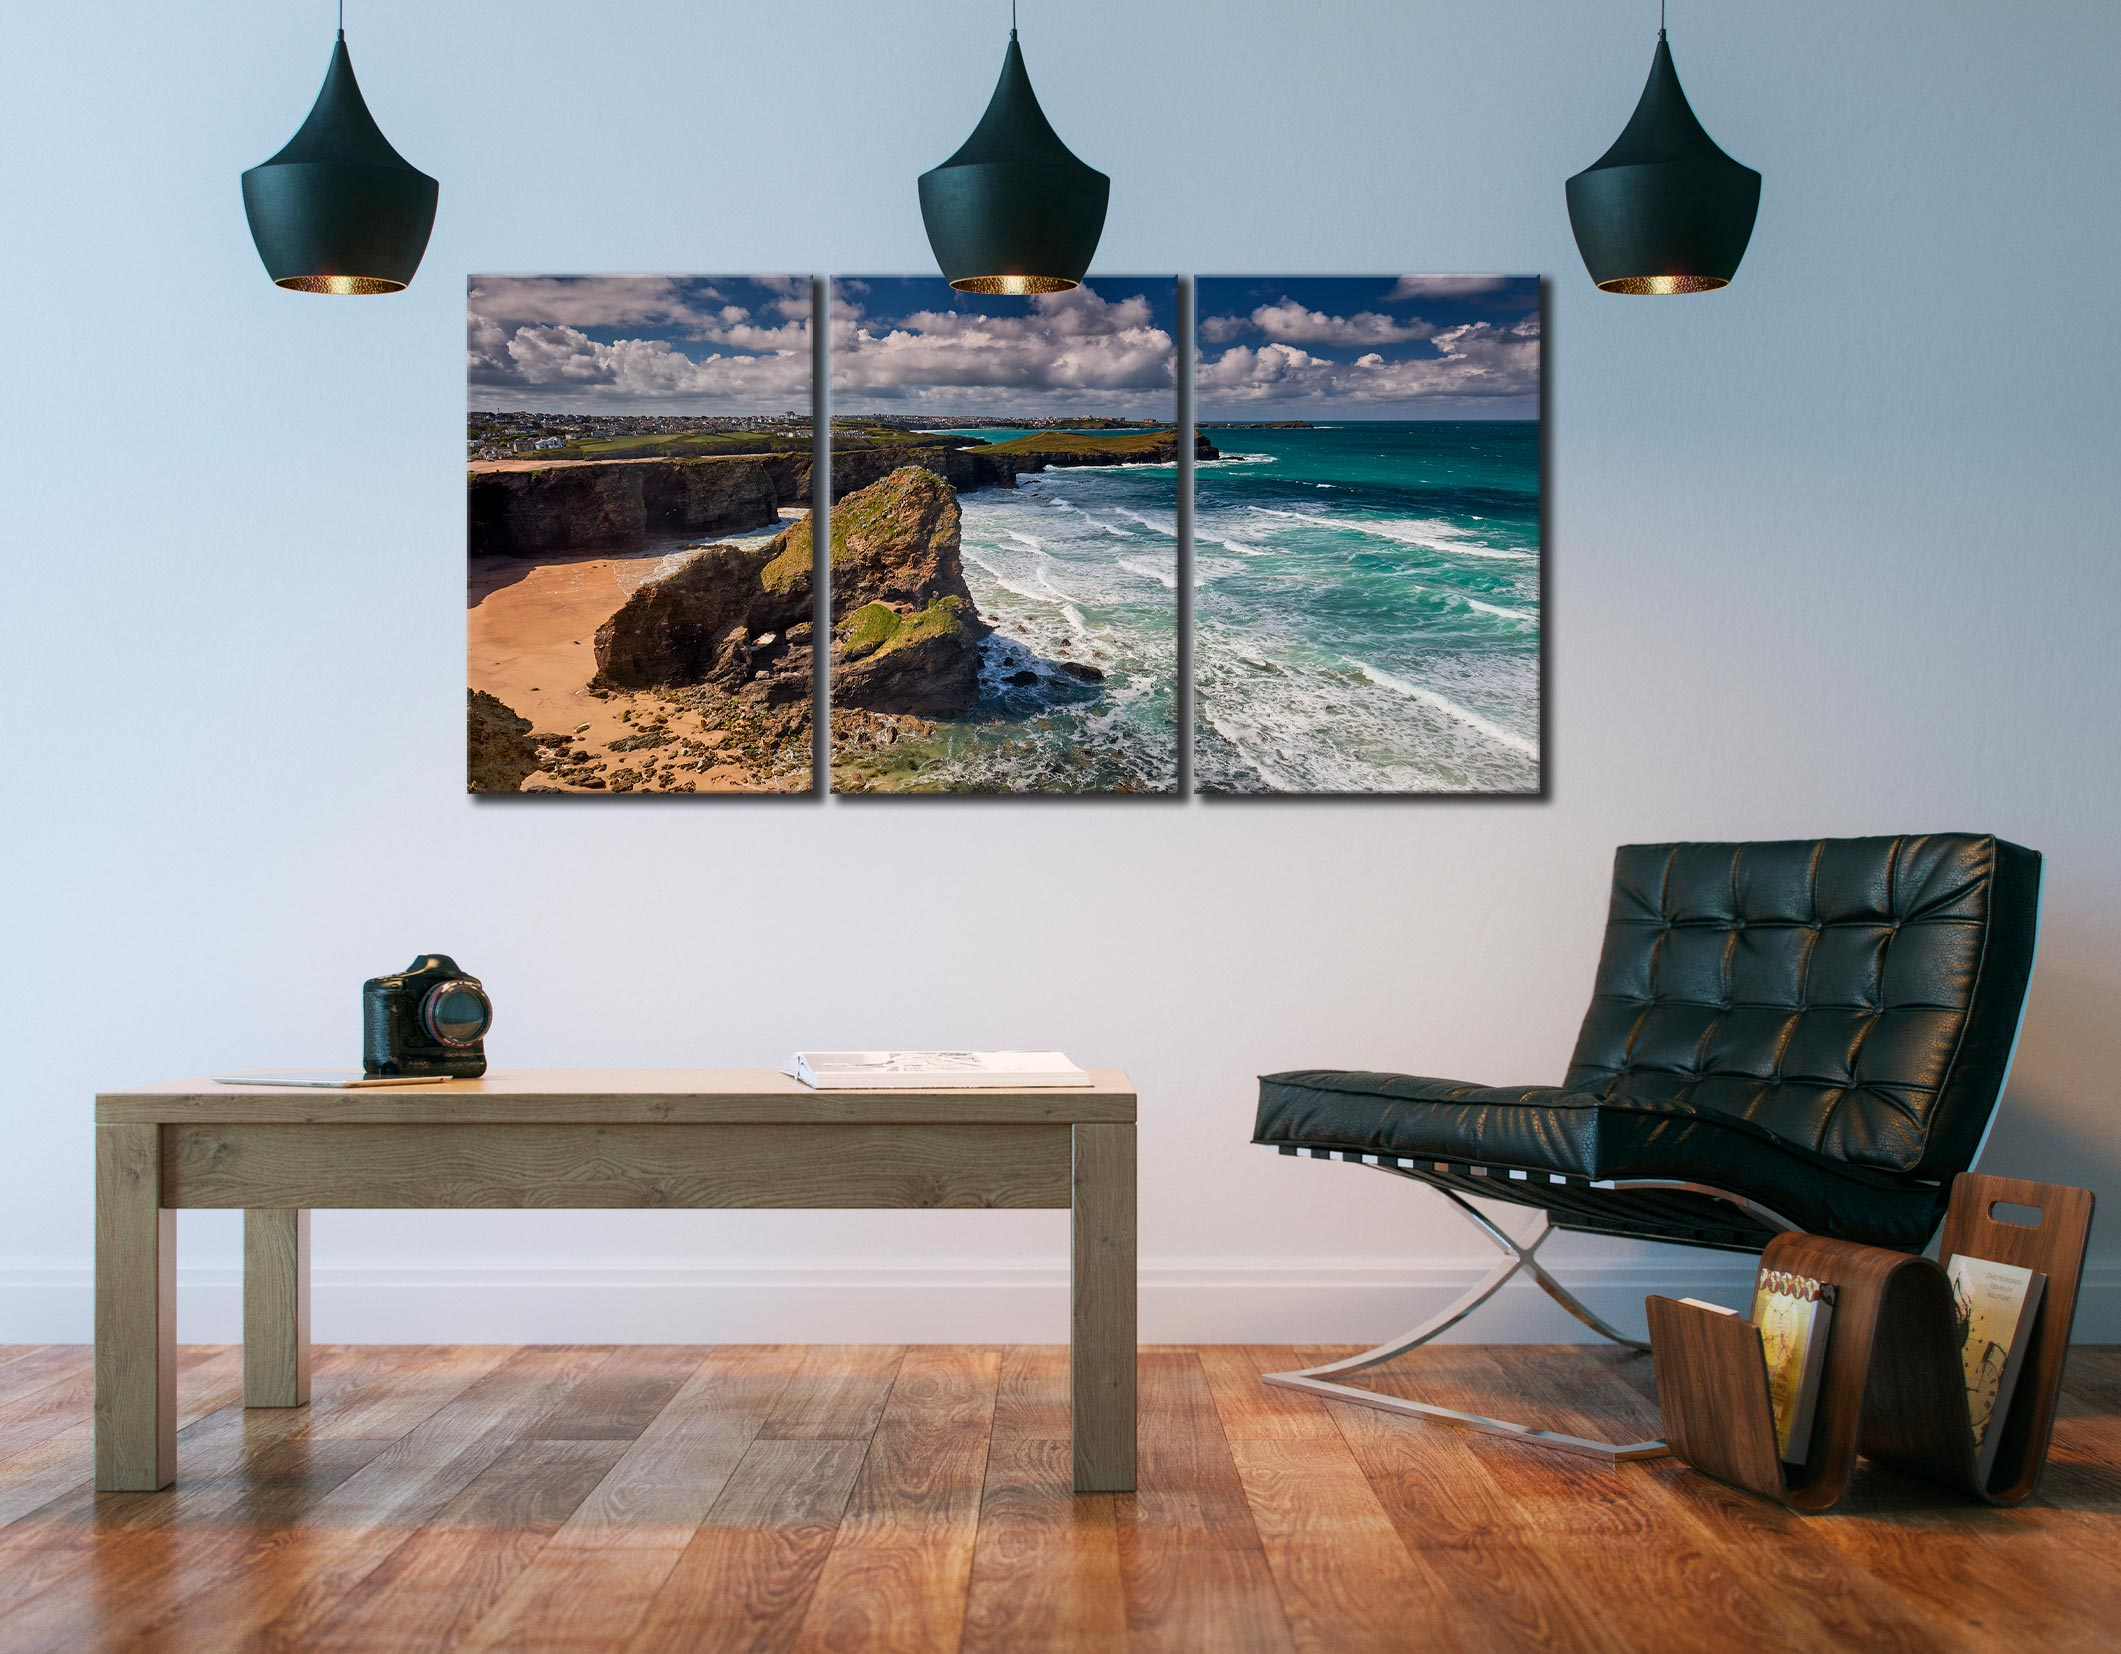 Black Humprey Rock - 3 Panel Canvas on Wall